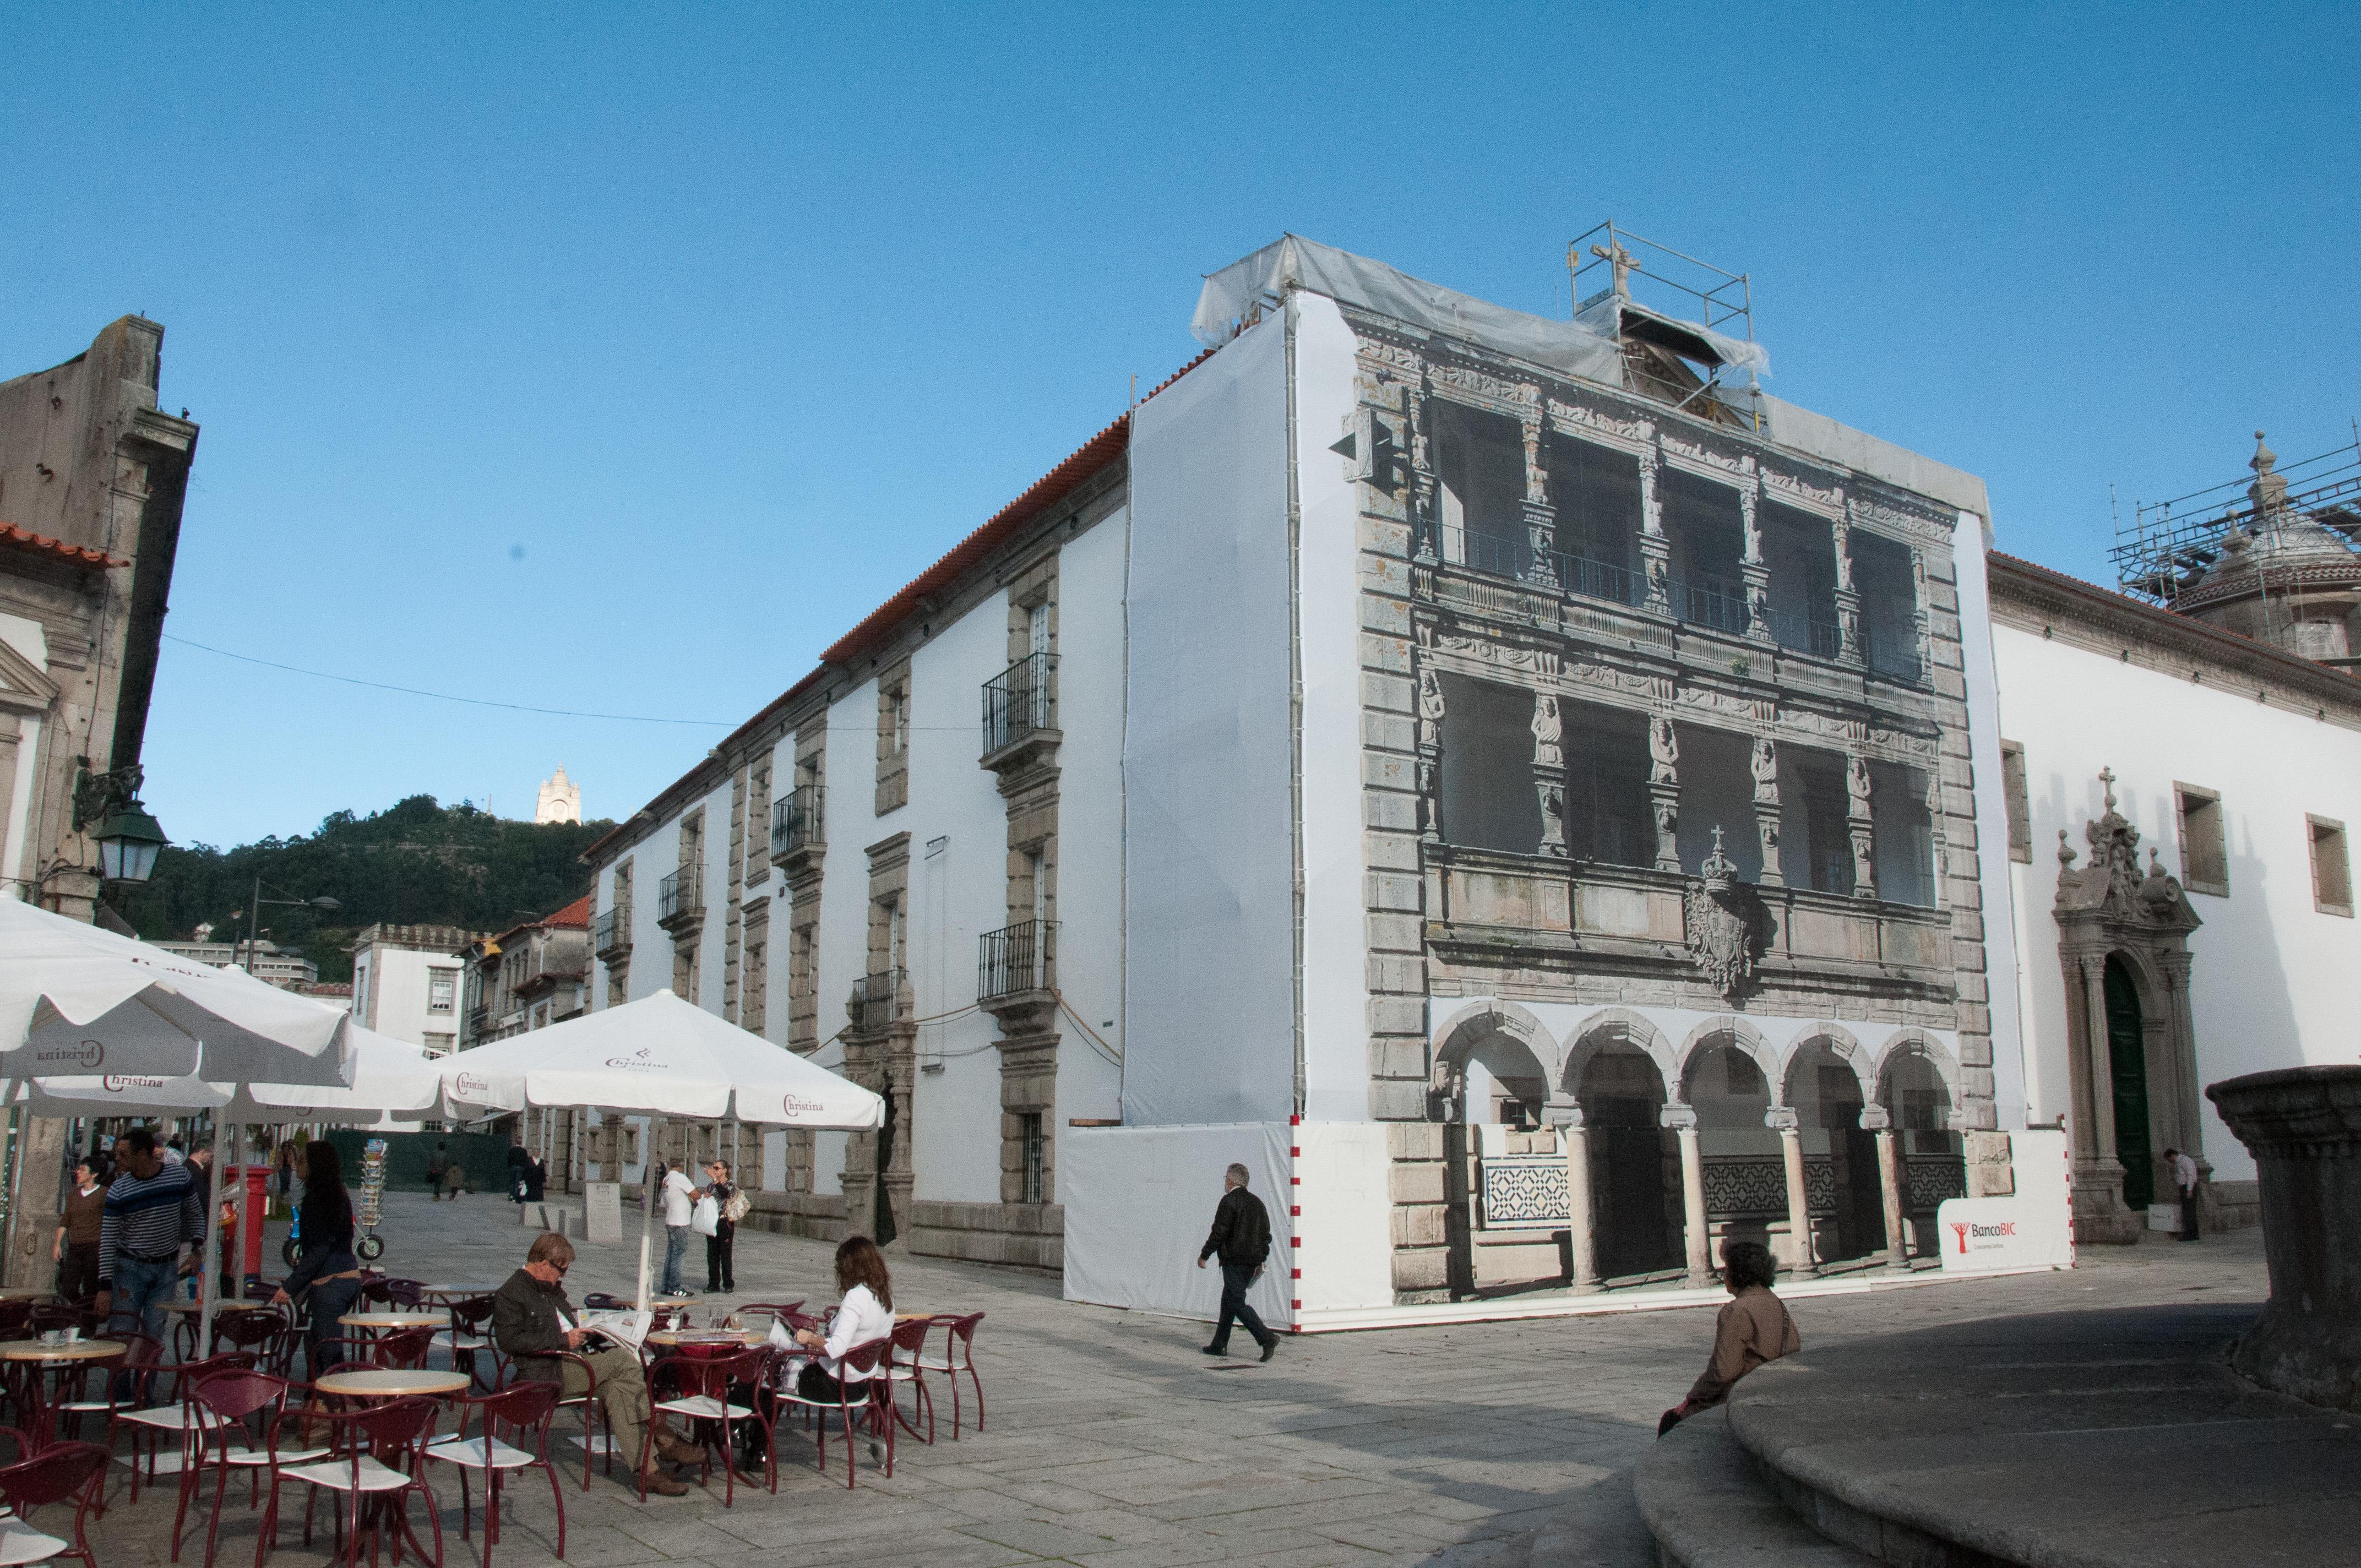 File viana do castelo portugal 13 8611322752 jpg - Viana do castelo portugal ...